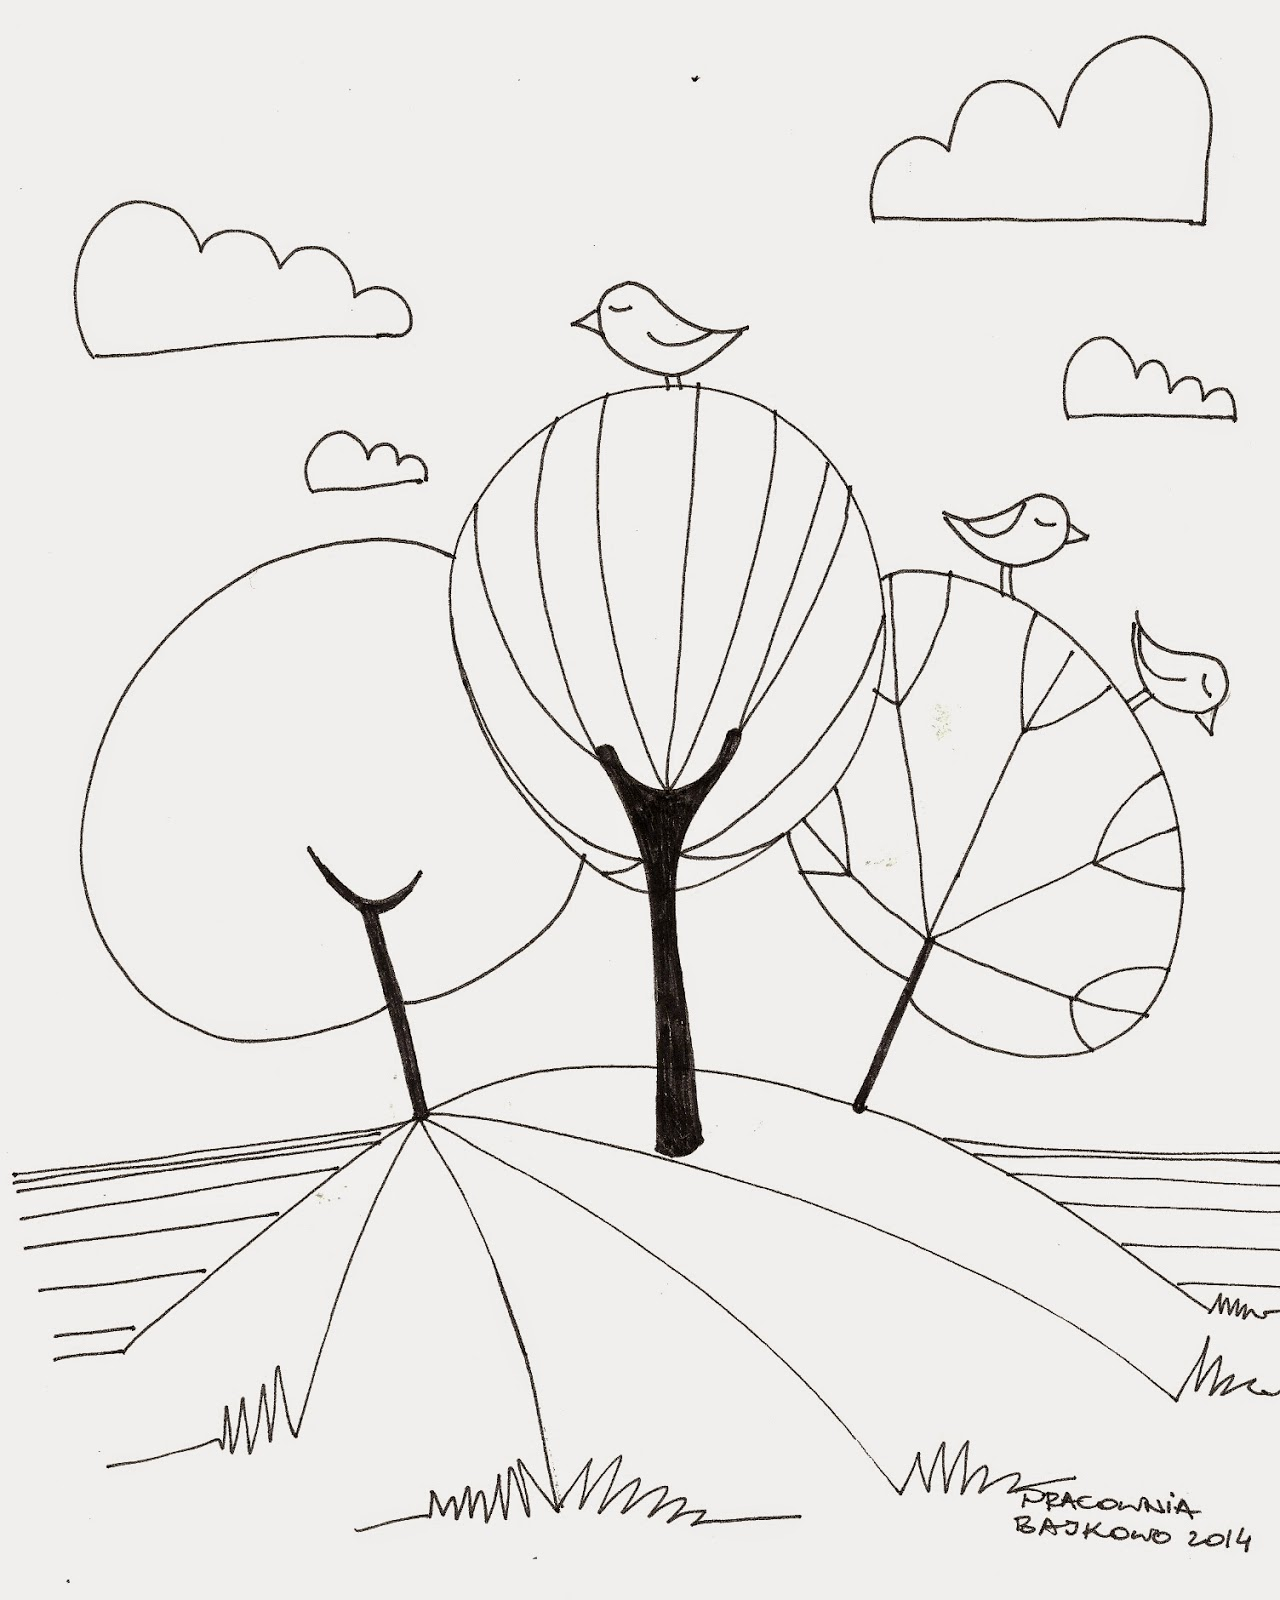 4 * kolorowanka, drzewa i ptaki